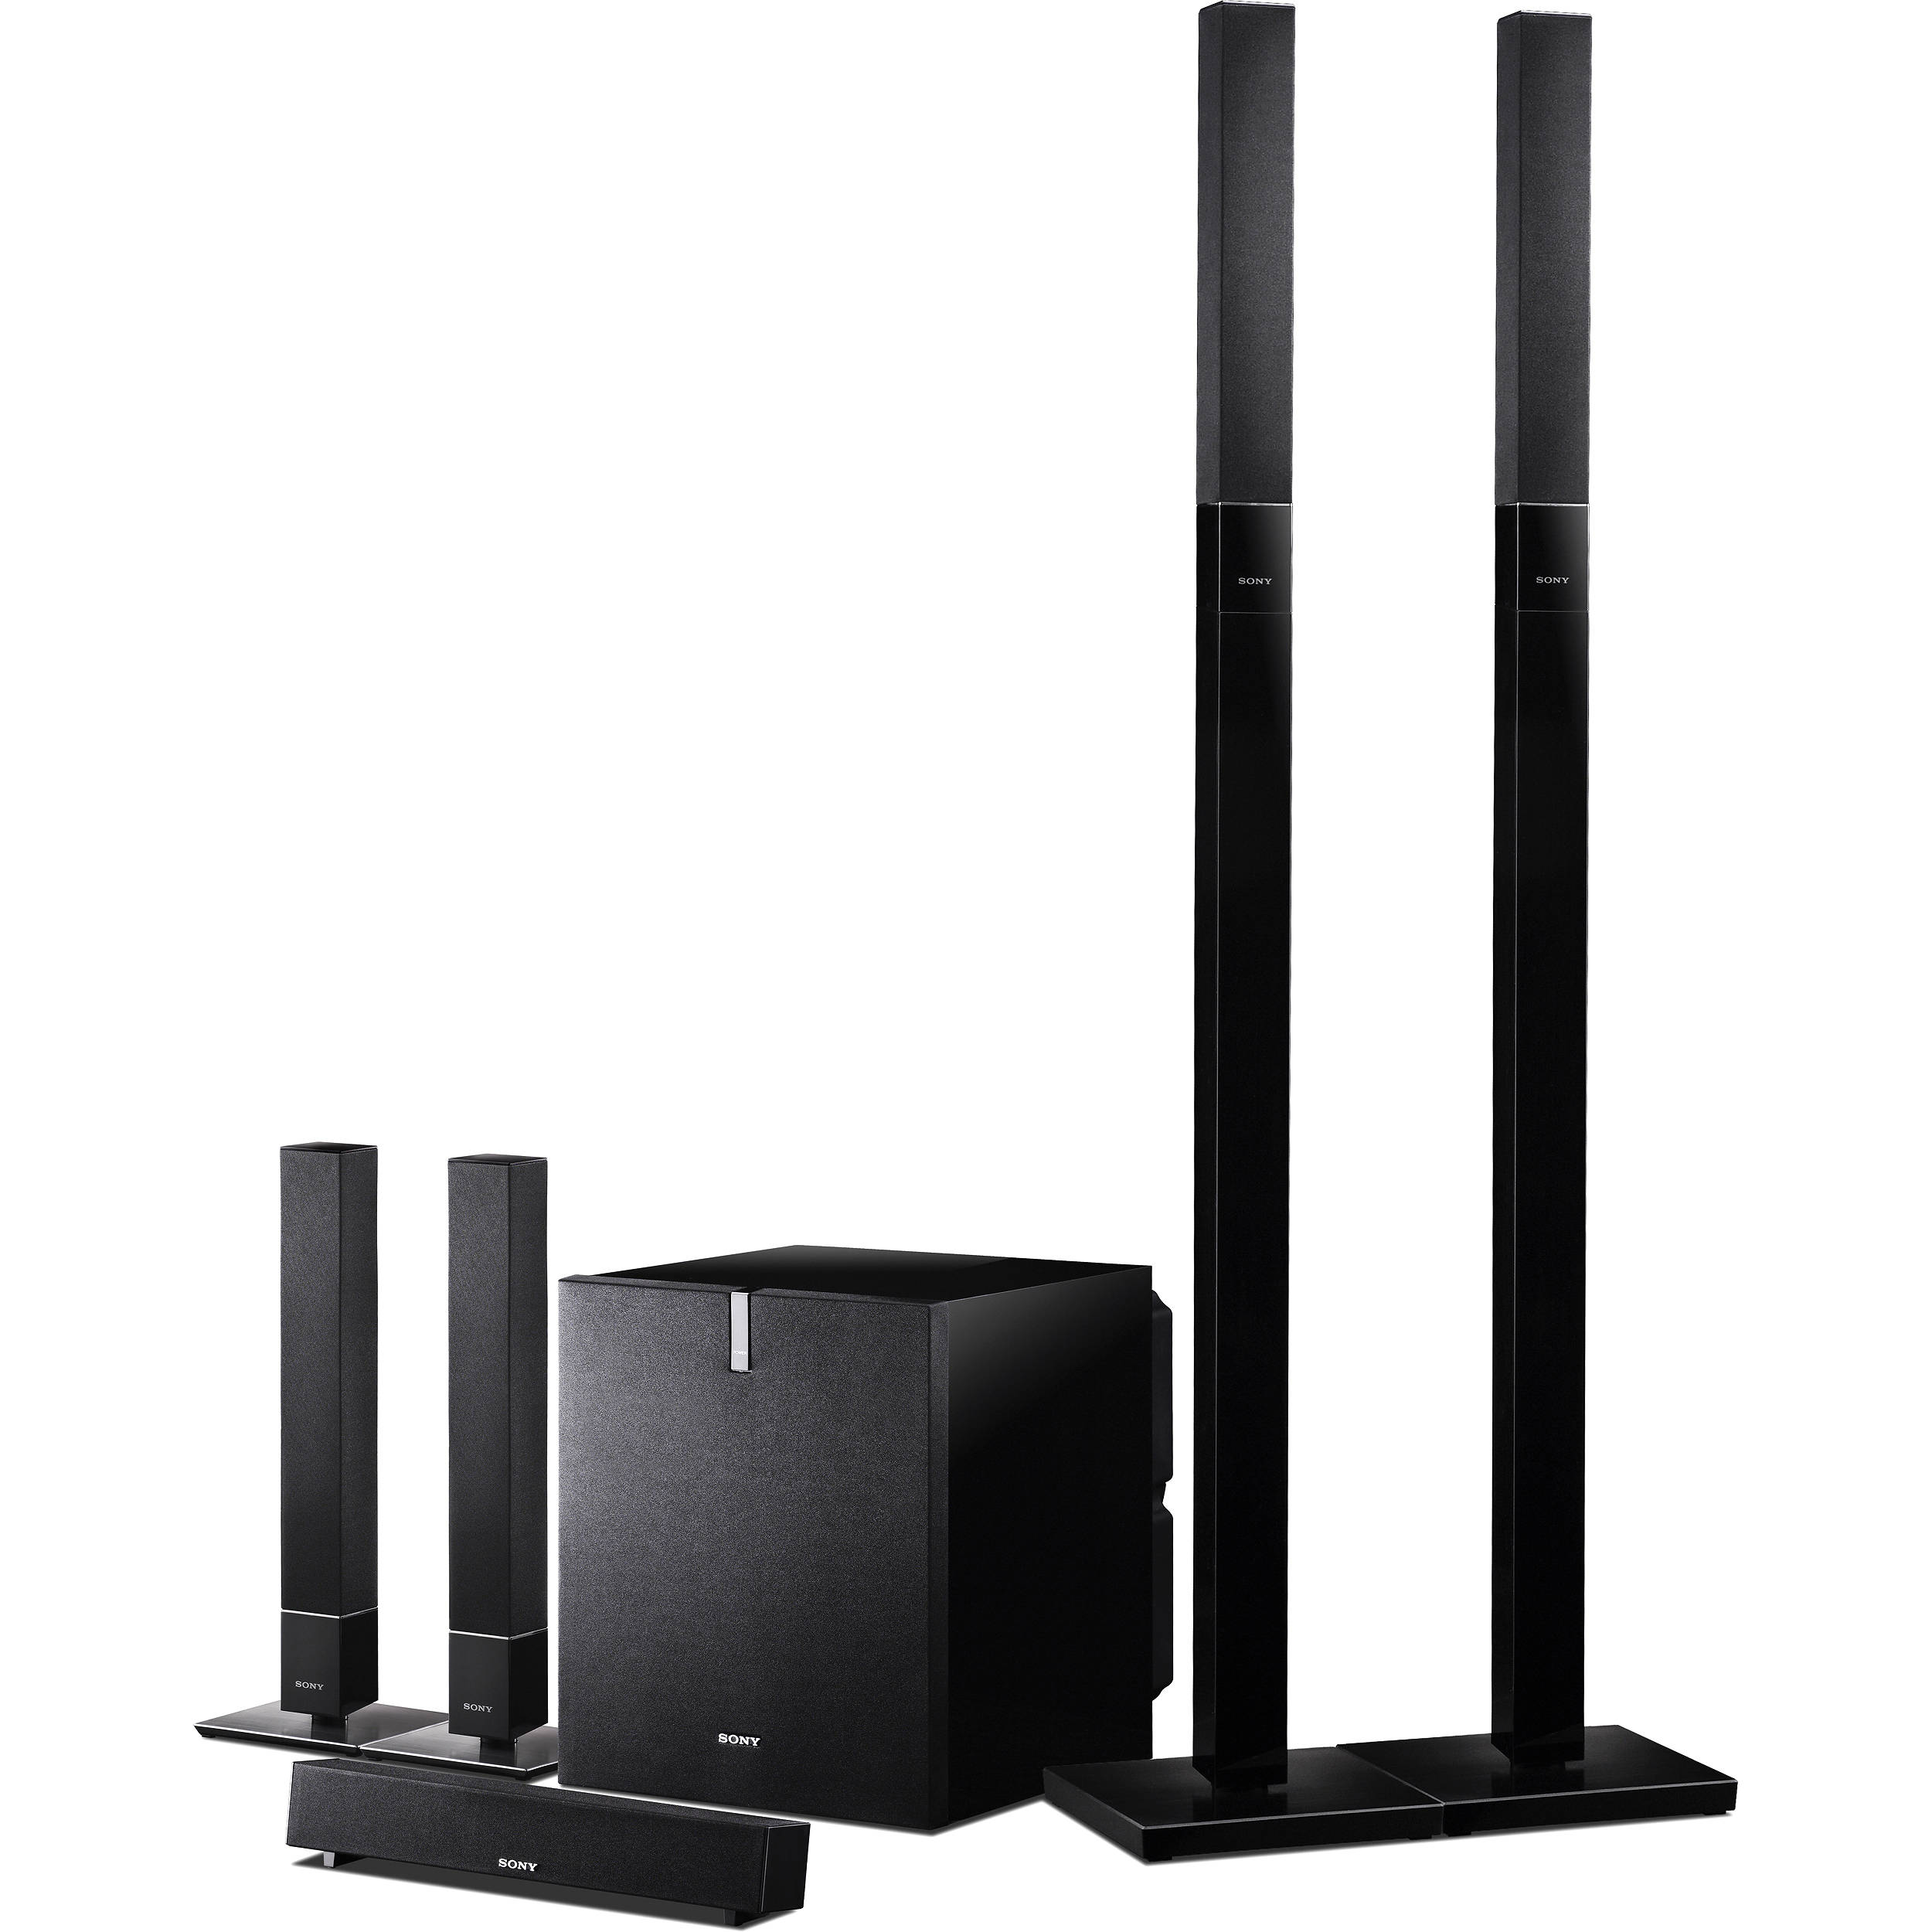 sony sa vs310 5 1 channel speaker system savs310 b h photo. Black Bedroom Furniture Sets. Home Design Ideas